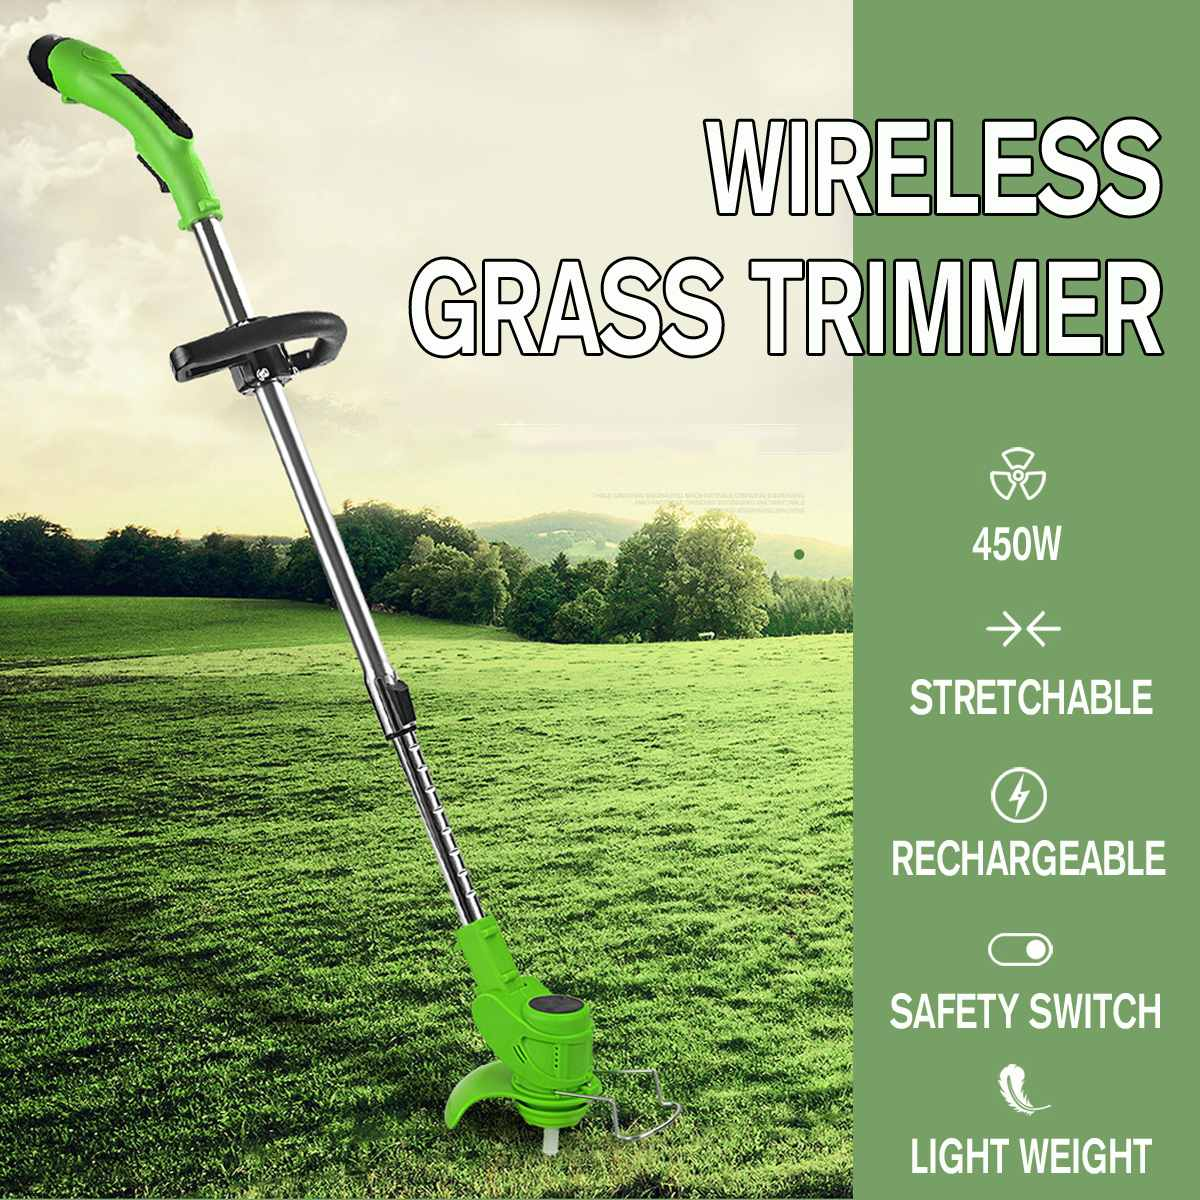 Portable Cordless Grass Trimmer Electric Trimmer Lithium Battery Garden Power Tools Lawn Cutter Mower Grass Cutting Machine